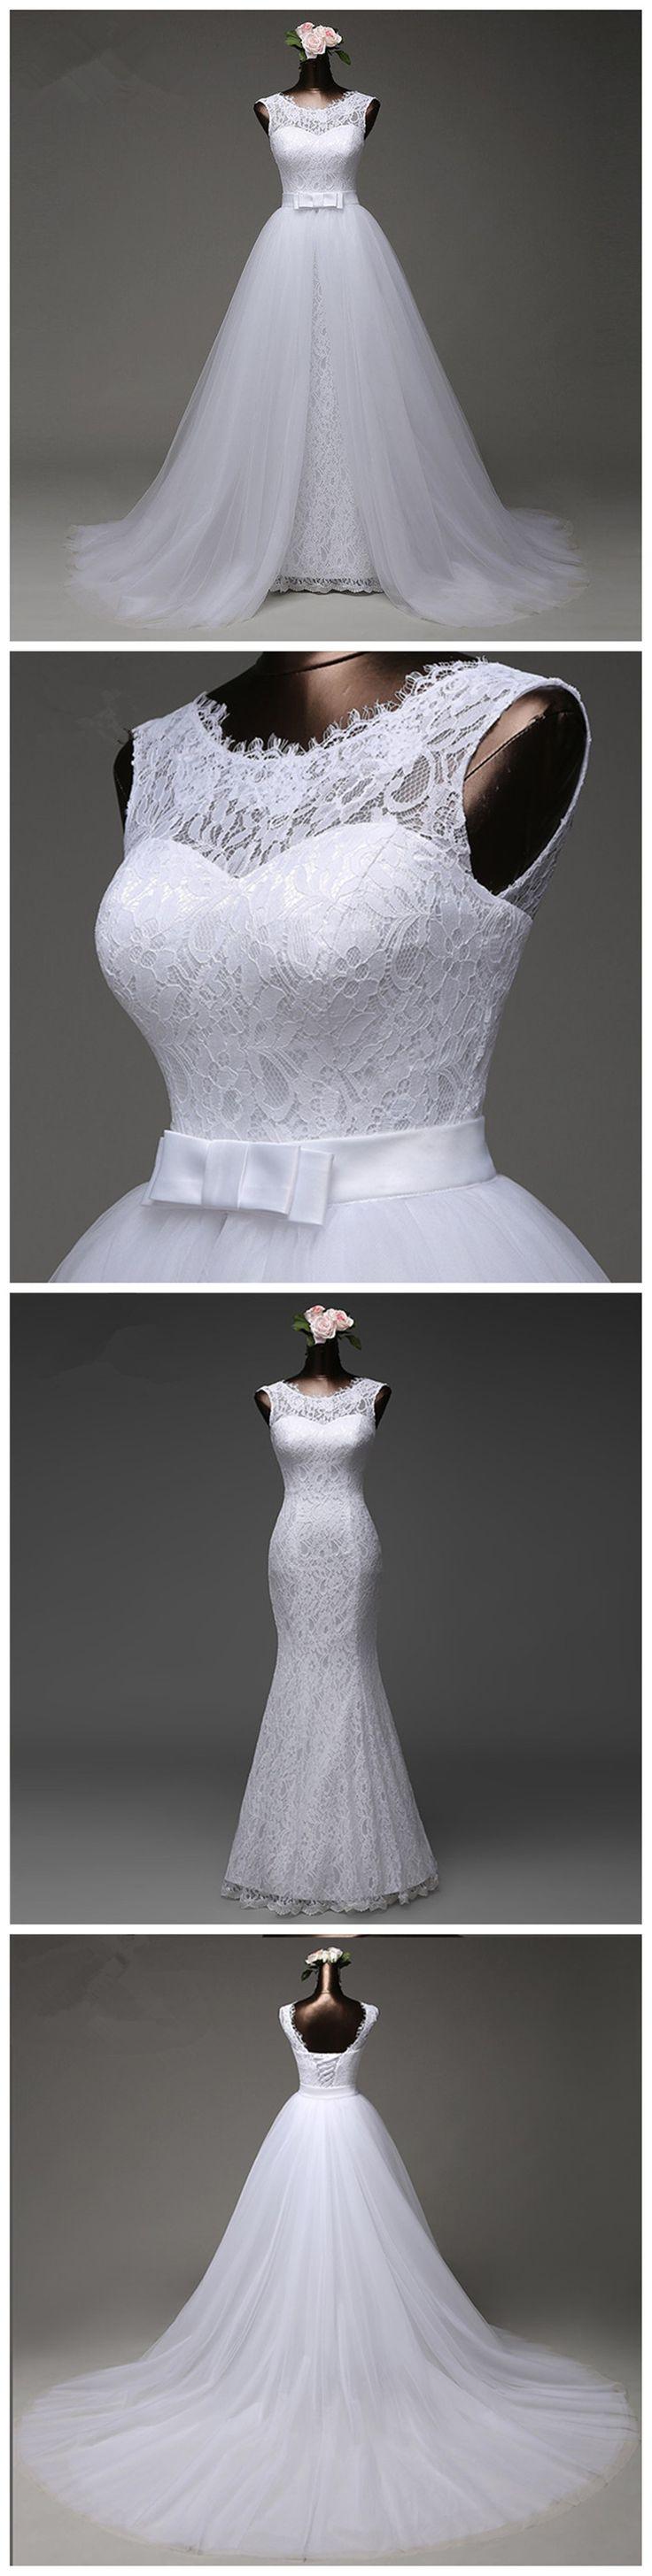 Unique Detachable Skirt Lace Mermaid Wedding Bridal Dresses, Custom Made Wedding Dresses, Affordable Wedding Bridal Gowns, WD239 #wedding #weddingdresses #laceweddingdresses #cheapweddingdresses #mermaidweddingdress #bridal #bridaldresses